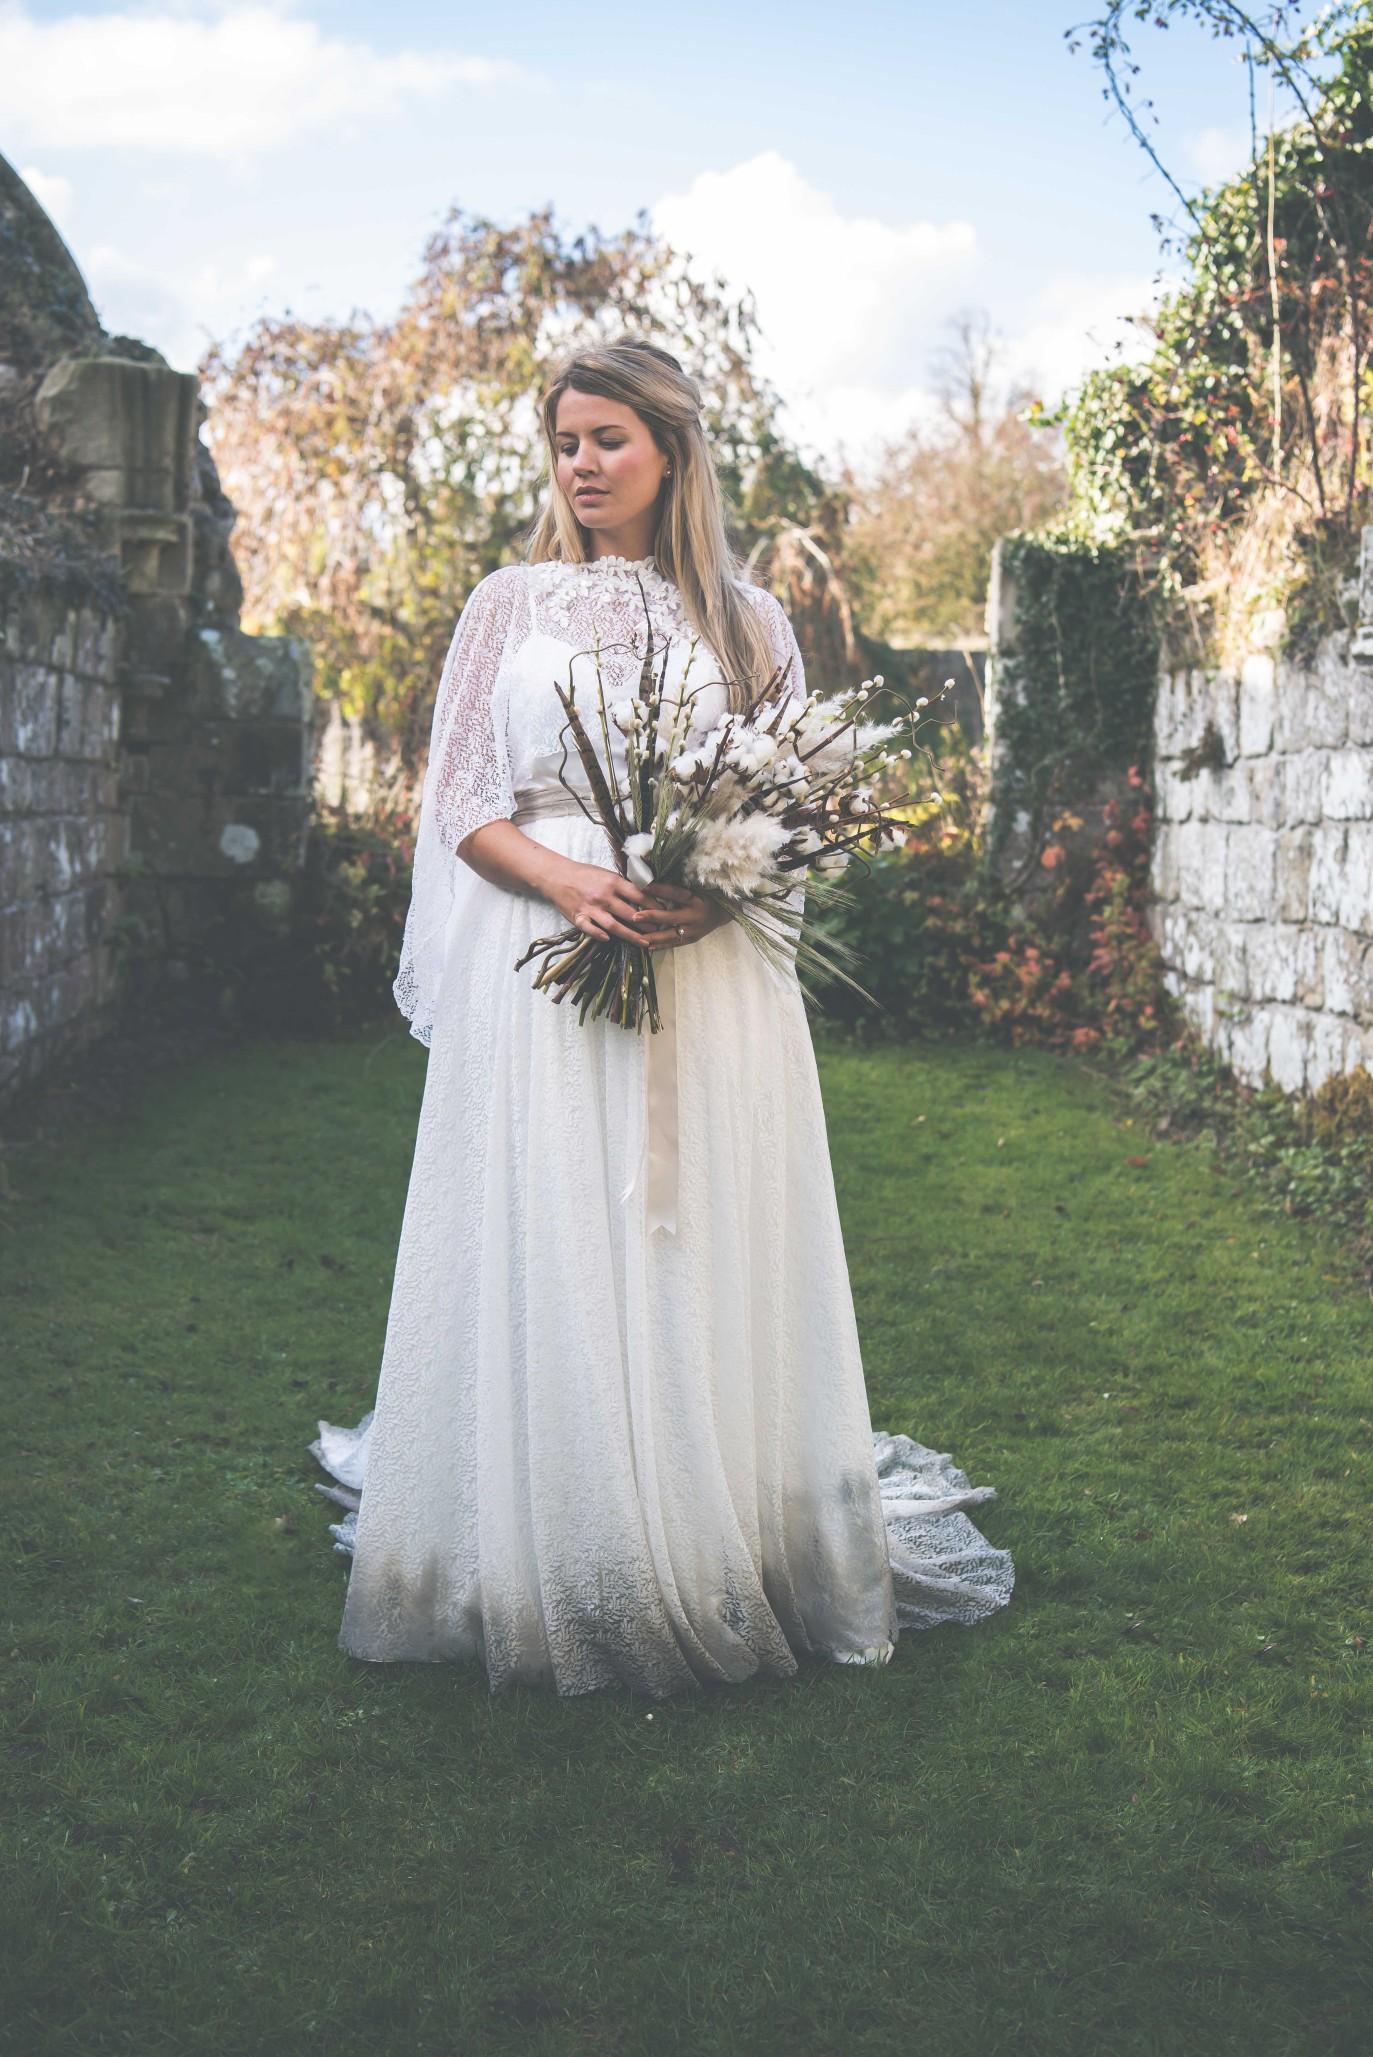 Live your own fairytale wedding - BexBrides - Jervaulx-0015 [9627] (2)